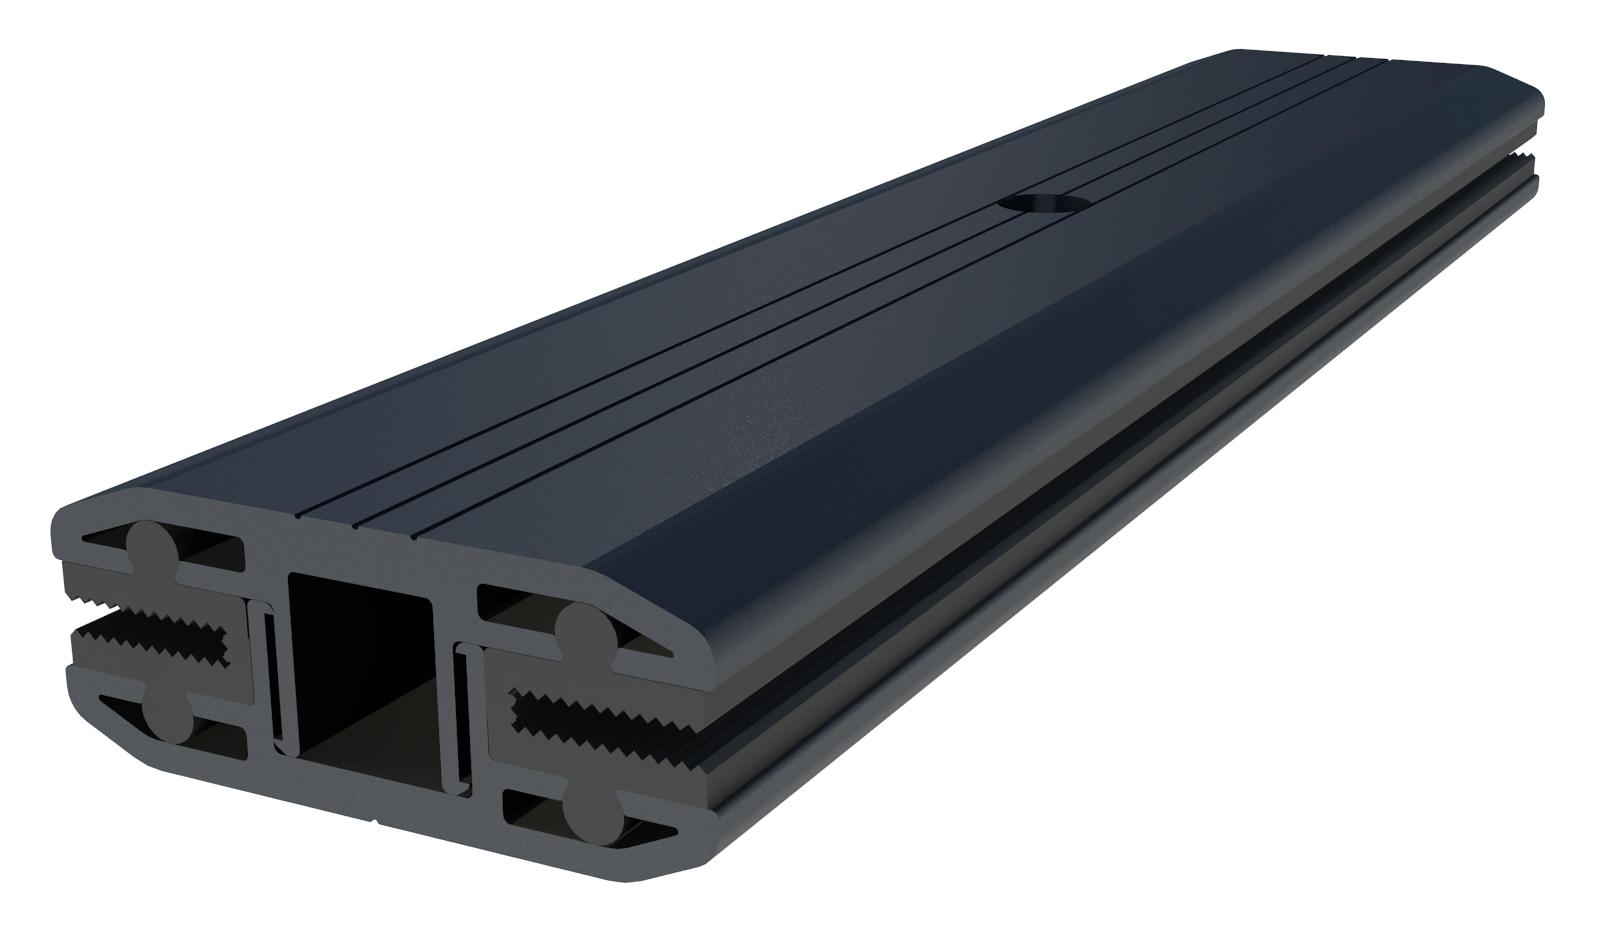 IronRidge FMLS-MC-001-B Frameless Module Mid Clamp, Black, Qty 1